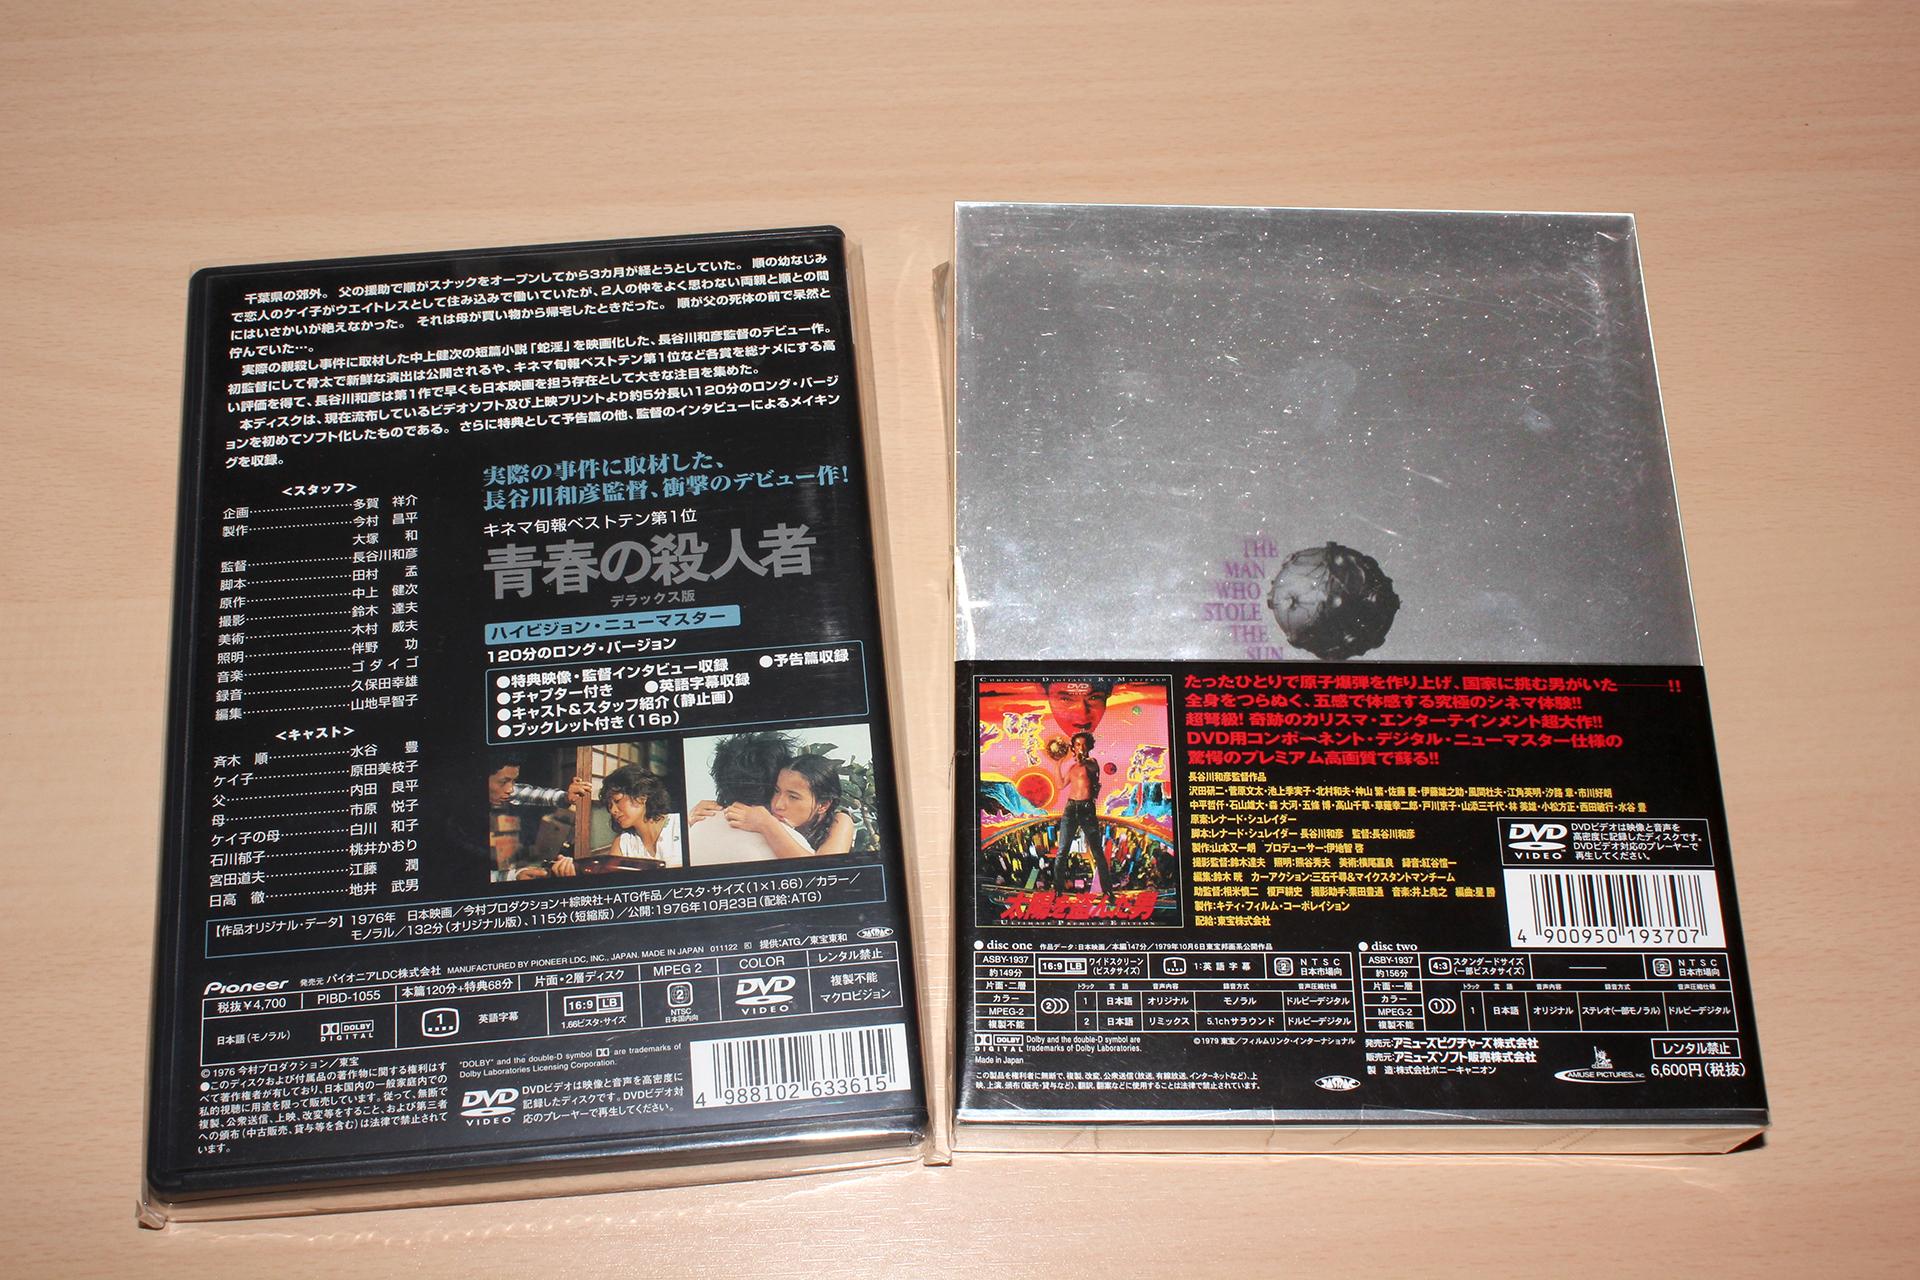 2014-02-12-YOUTH_KILLER-BD-2.JPG